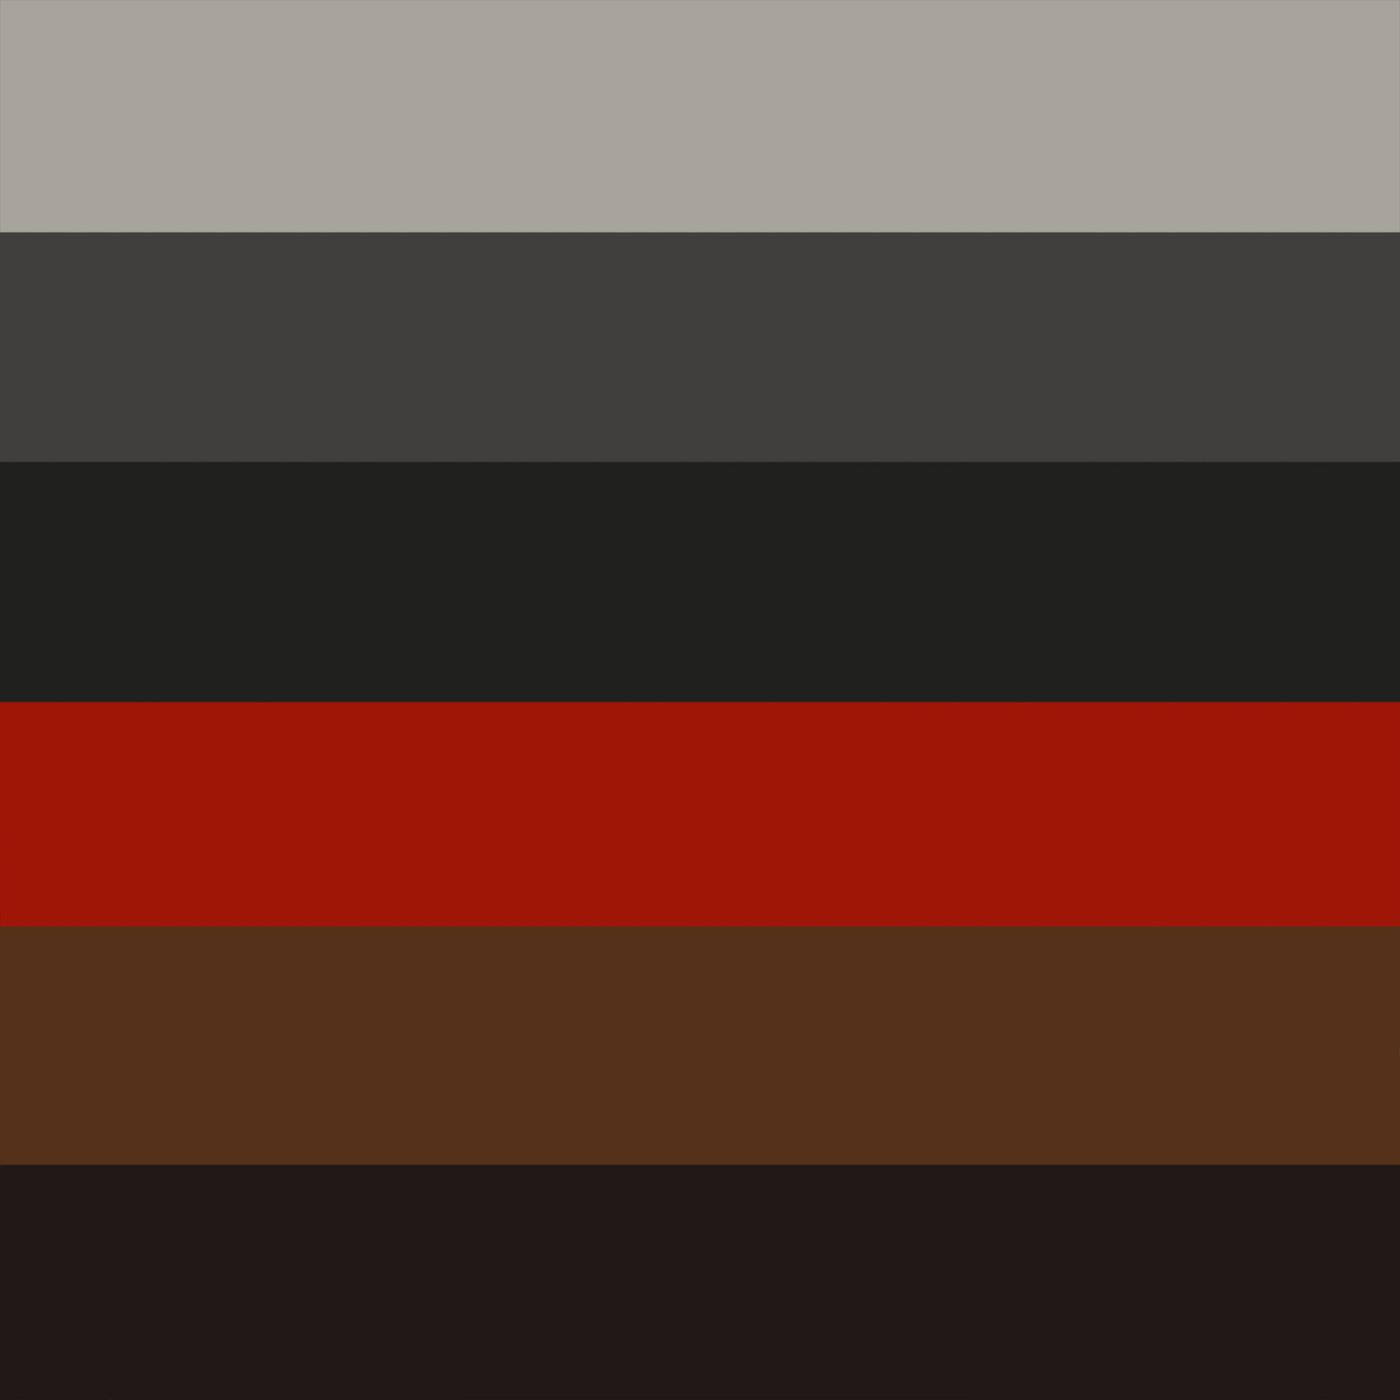 Black Rail (Laterallus jamaicensis)- Threatened